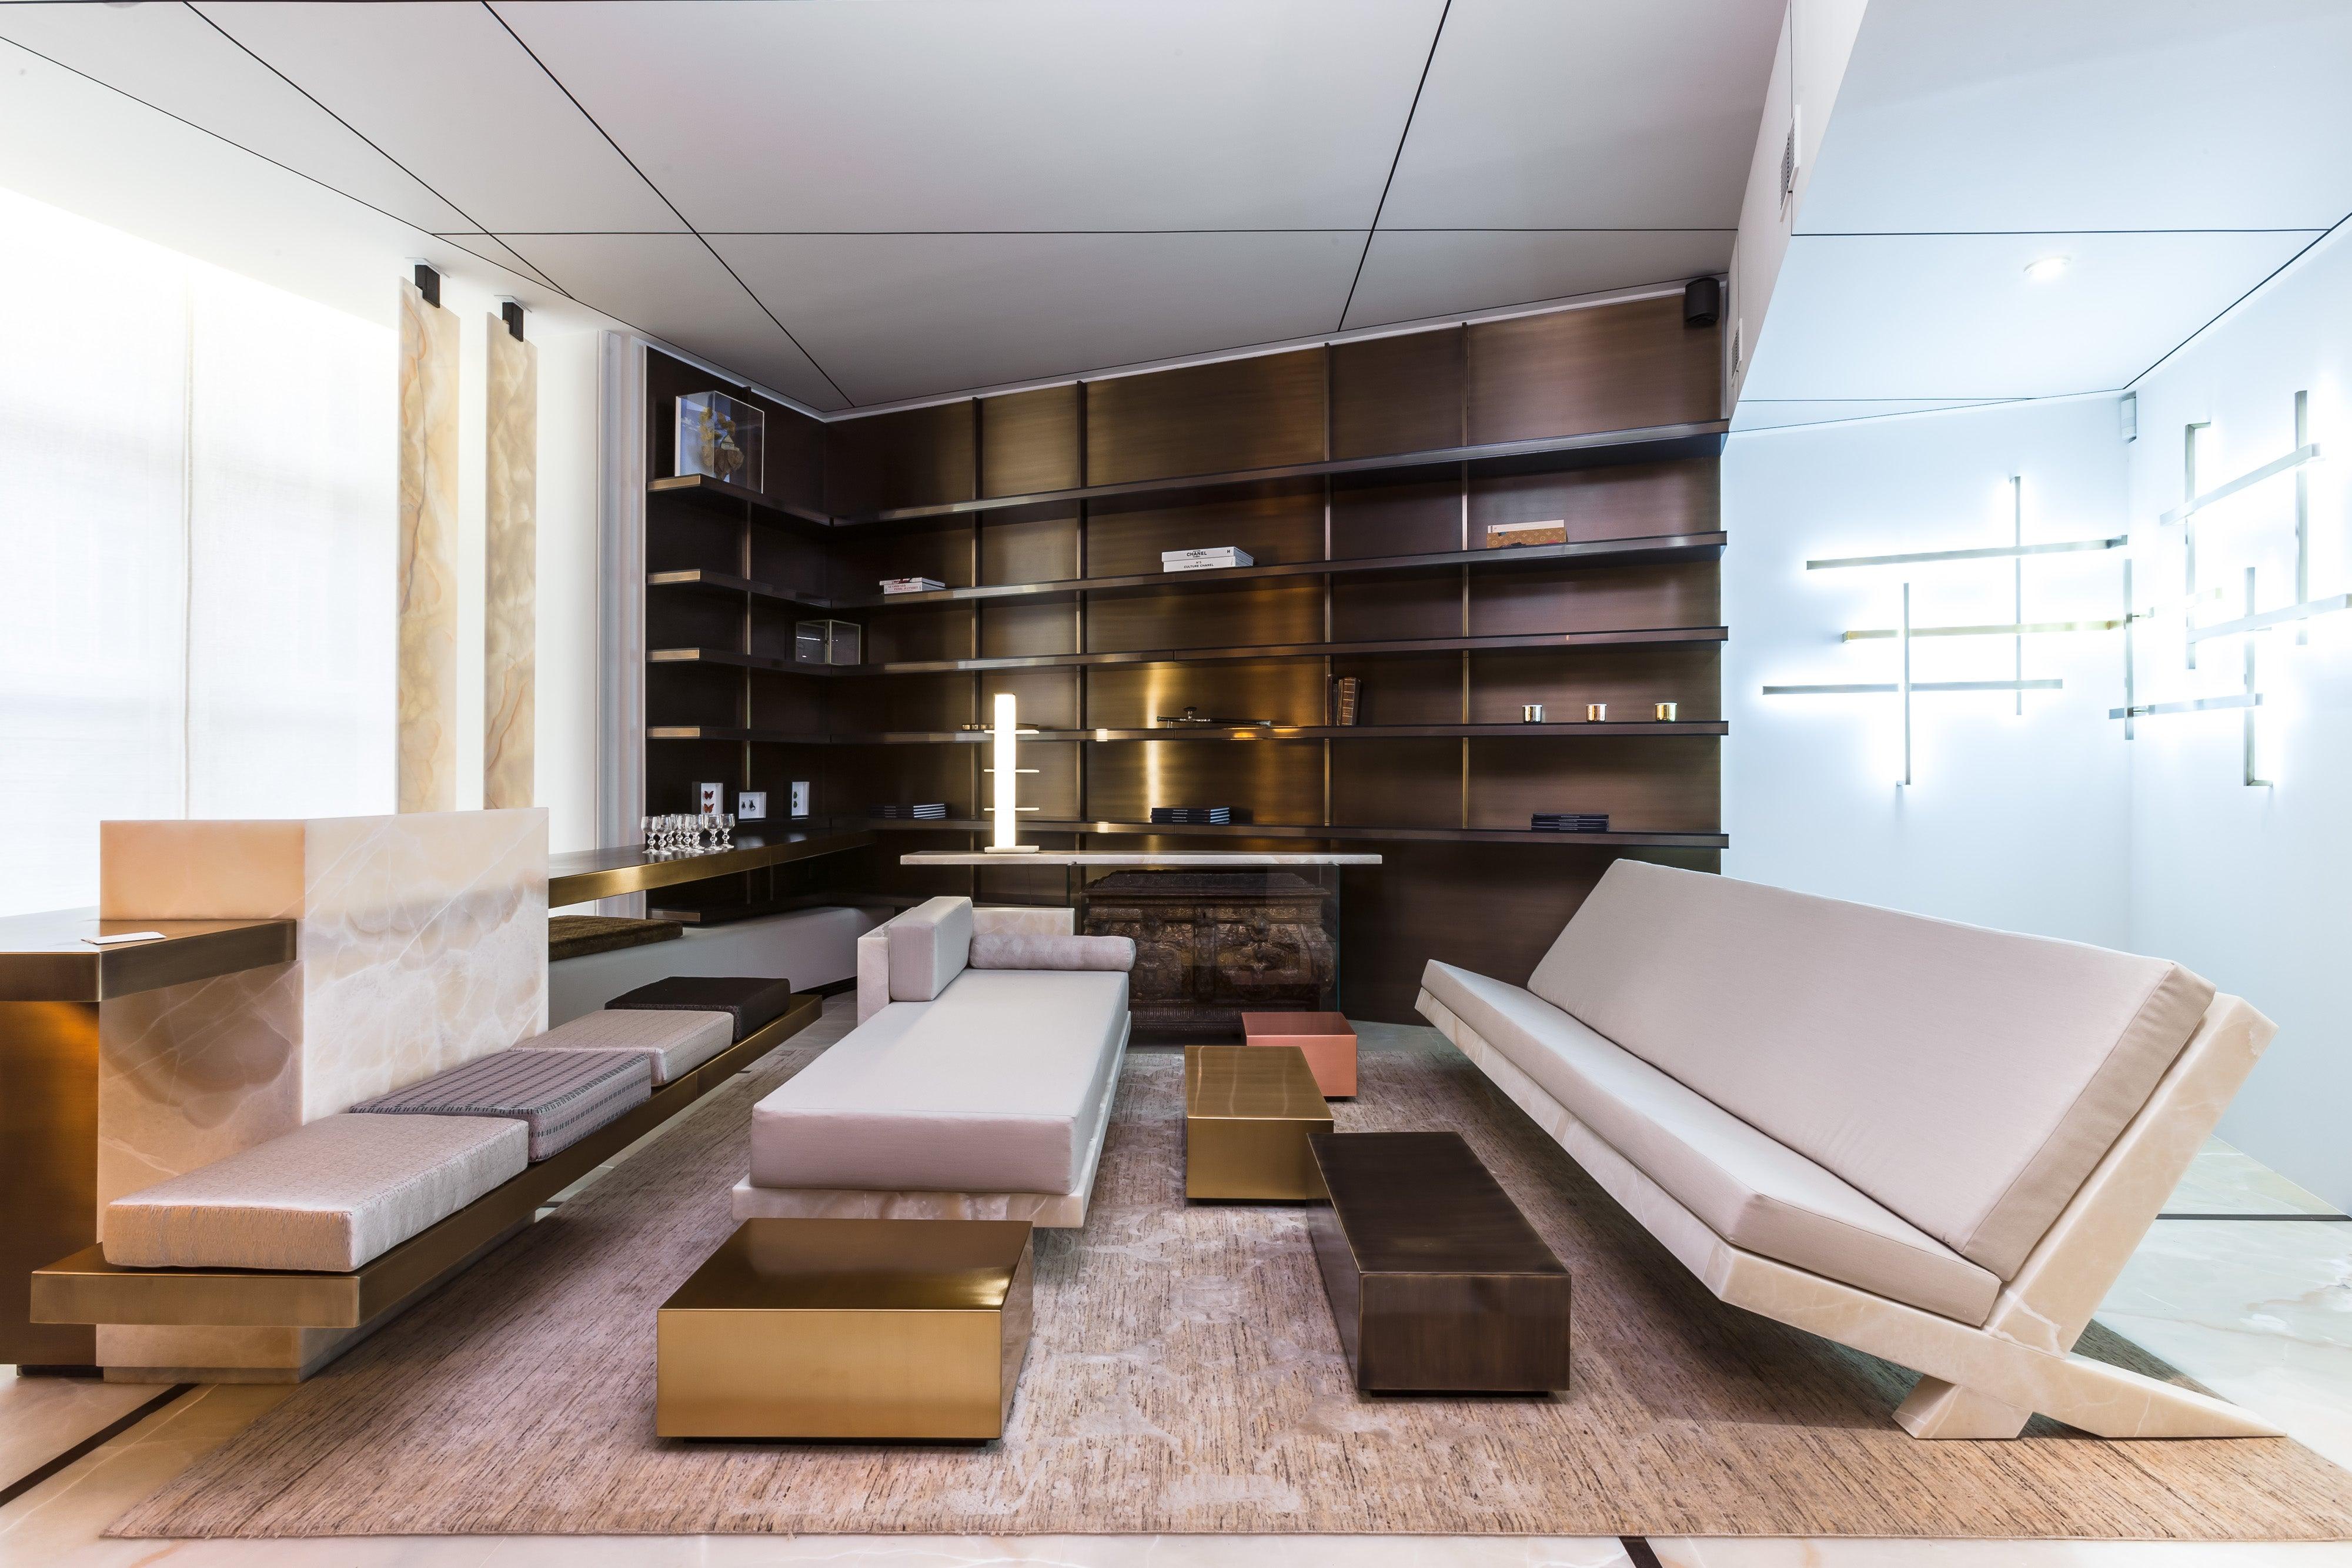 d cors vivre by isabelle stanislas architecture. Black Bedroom Furniture Sets. Home Design Ideas